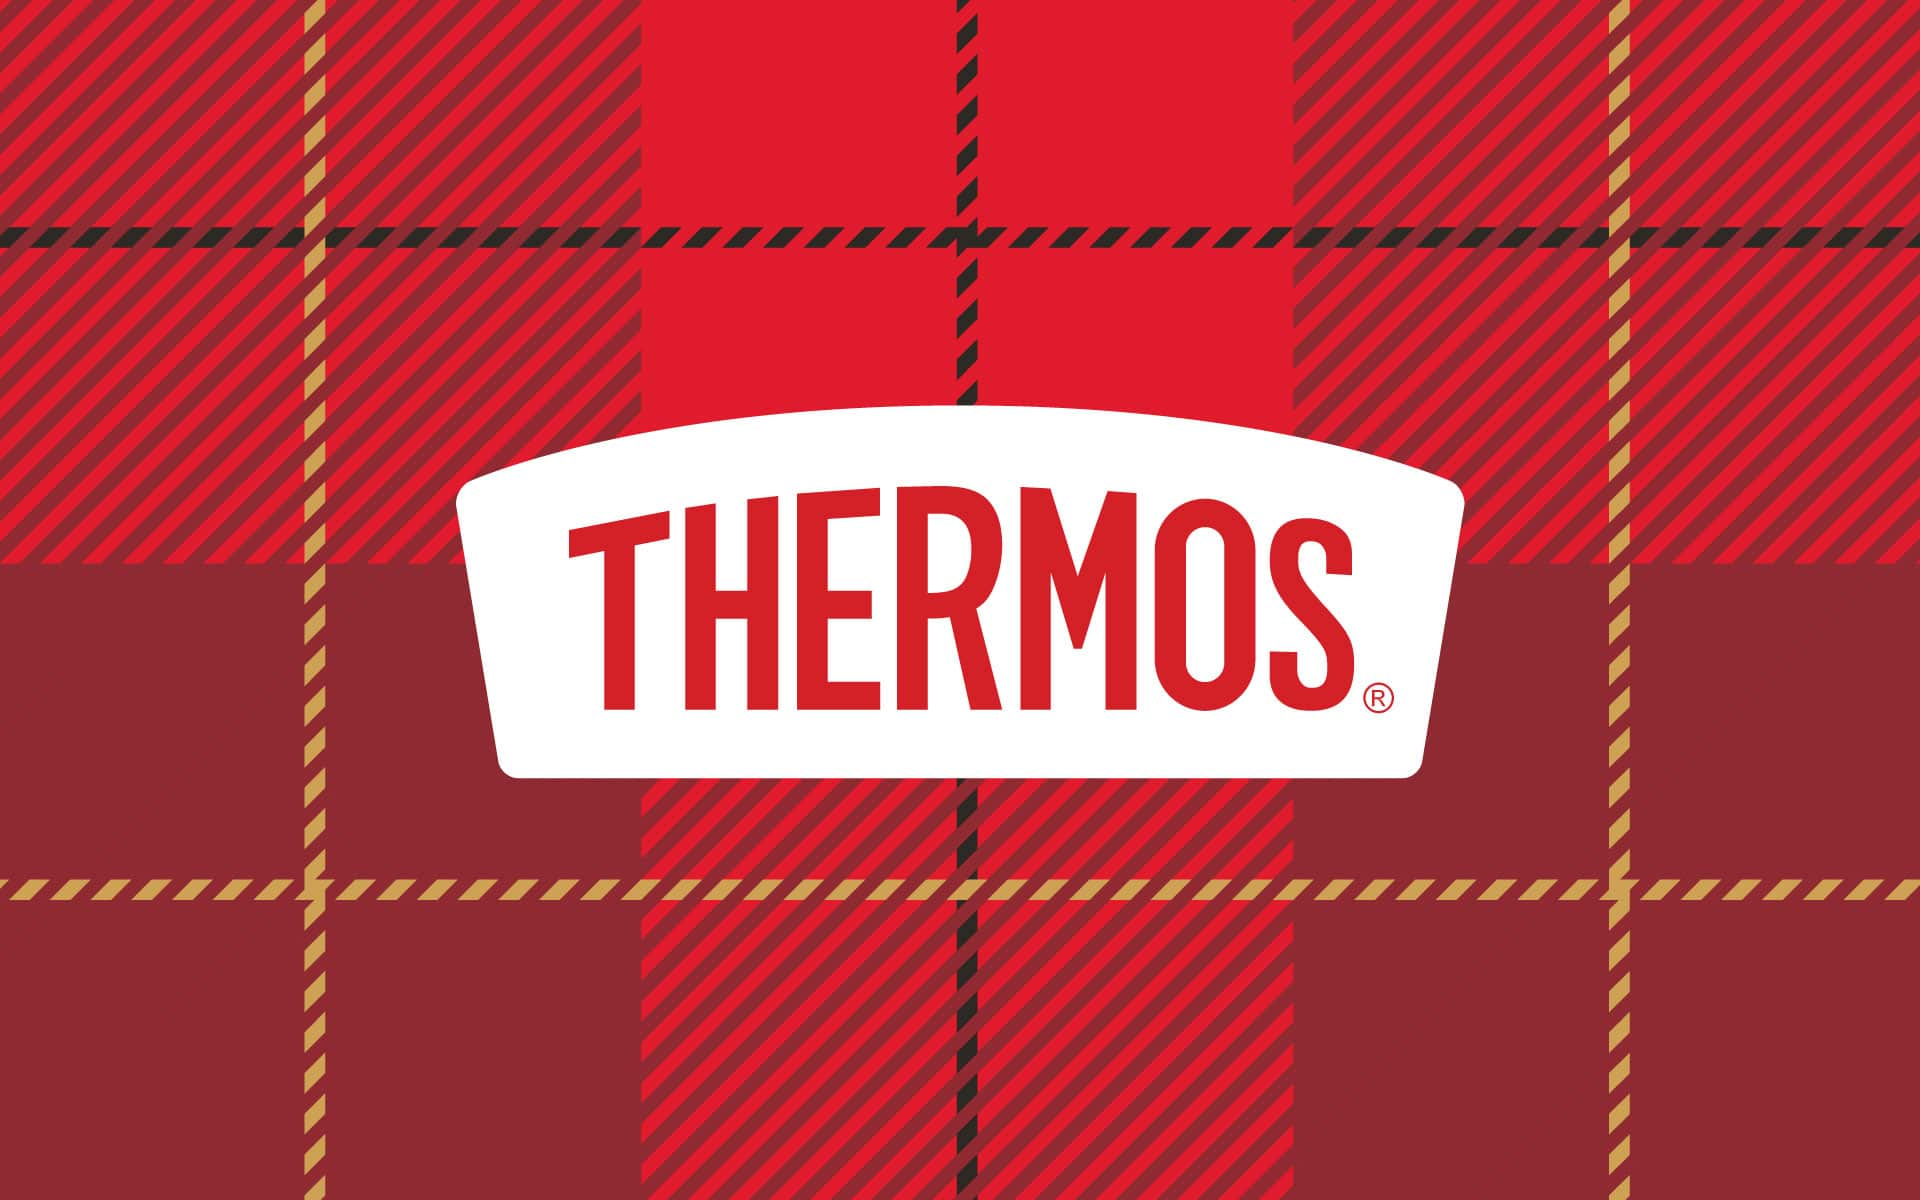 Thermos - Brand Identity